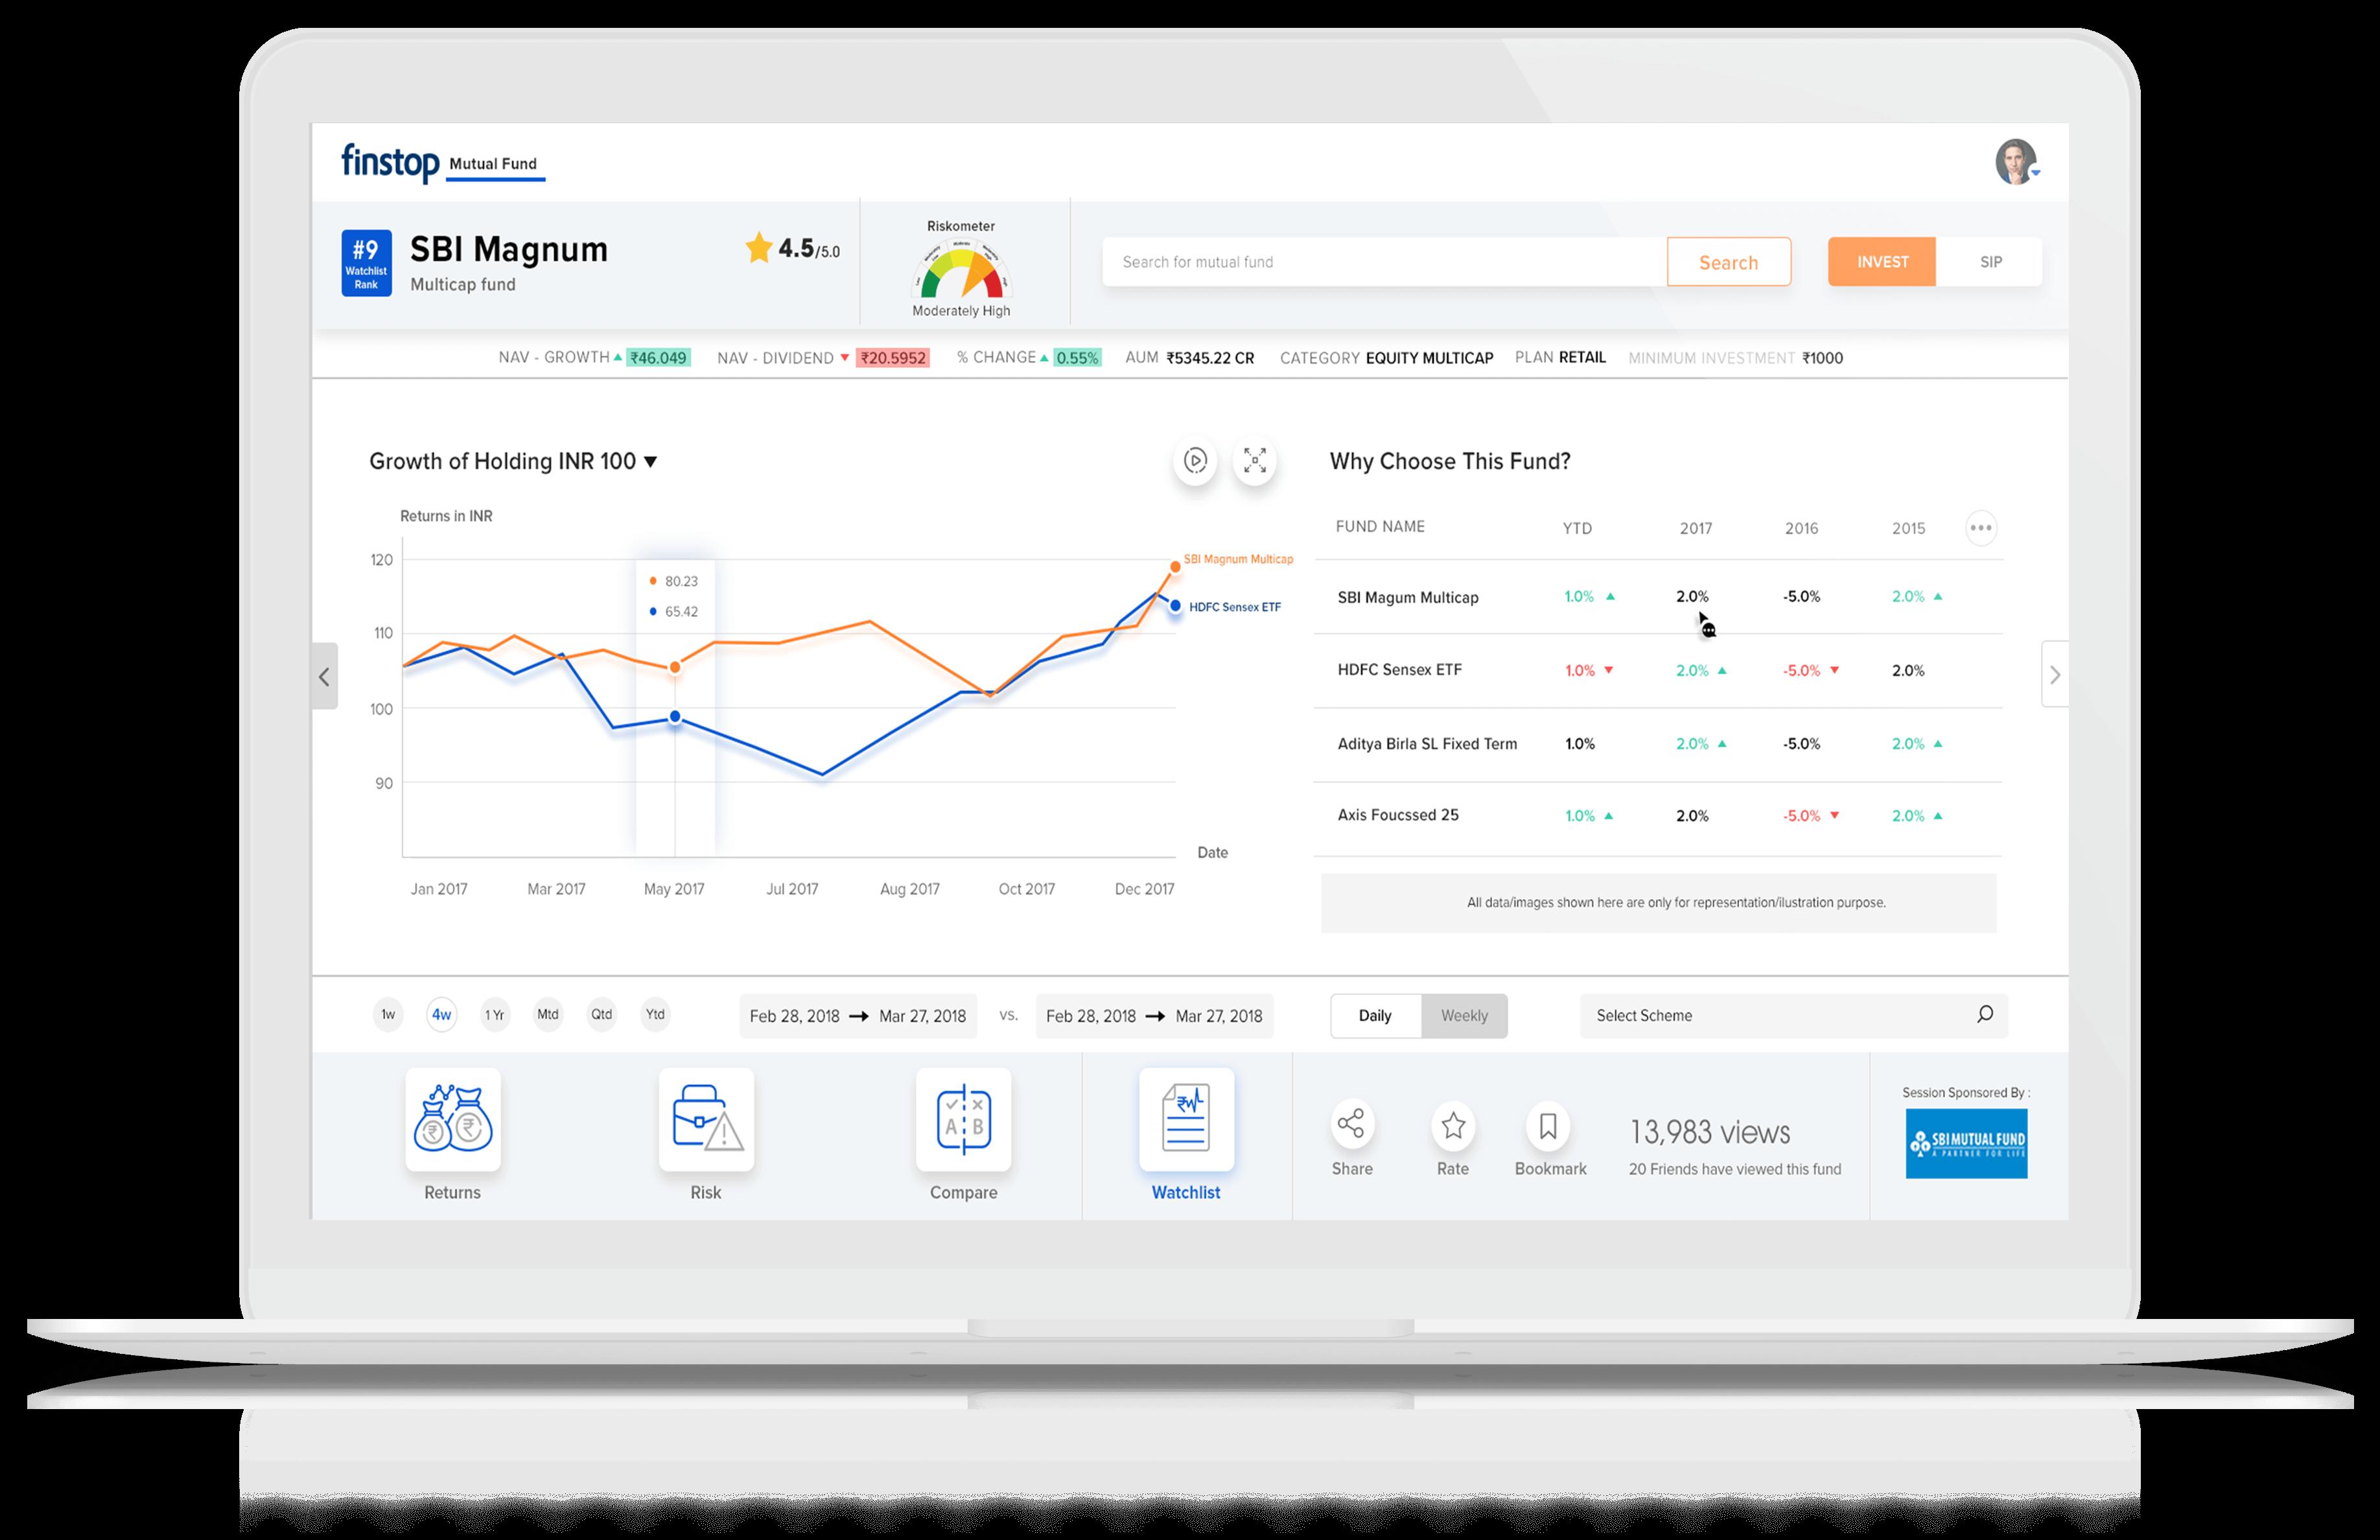 finstop mutual funds - SBI fund sample